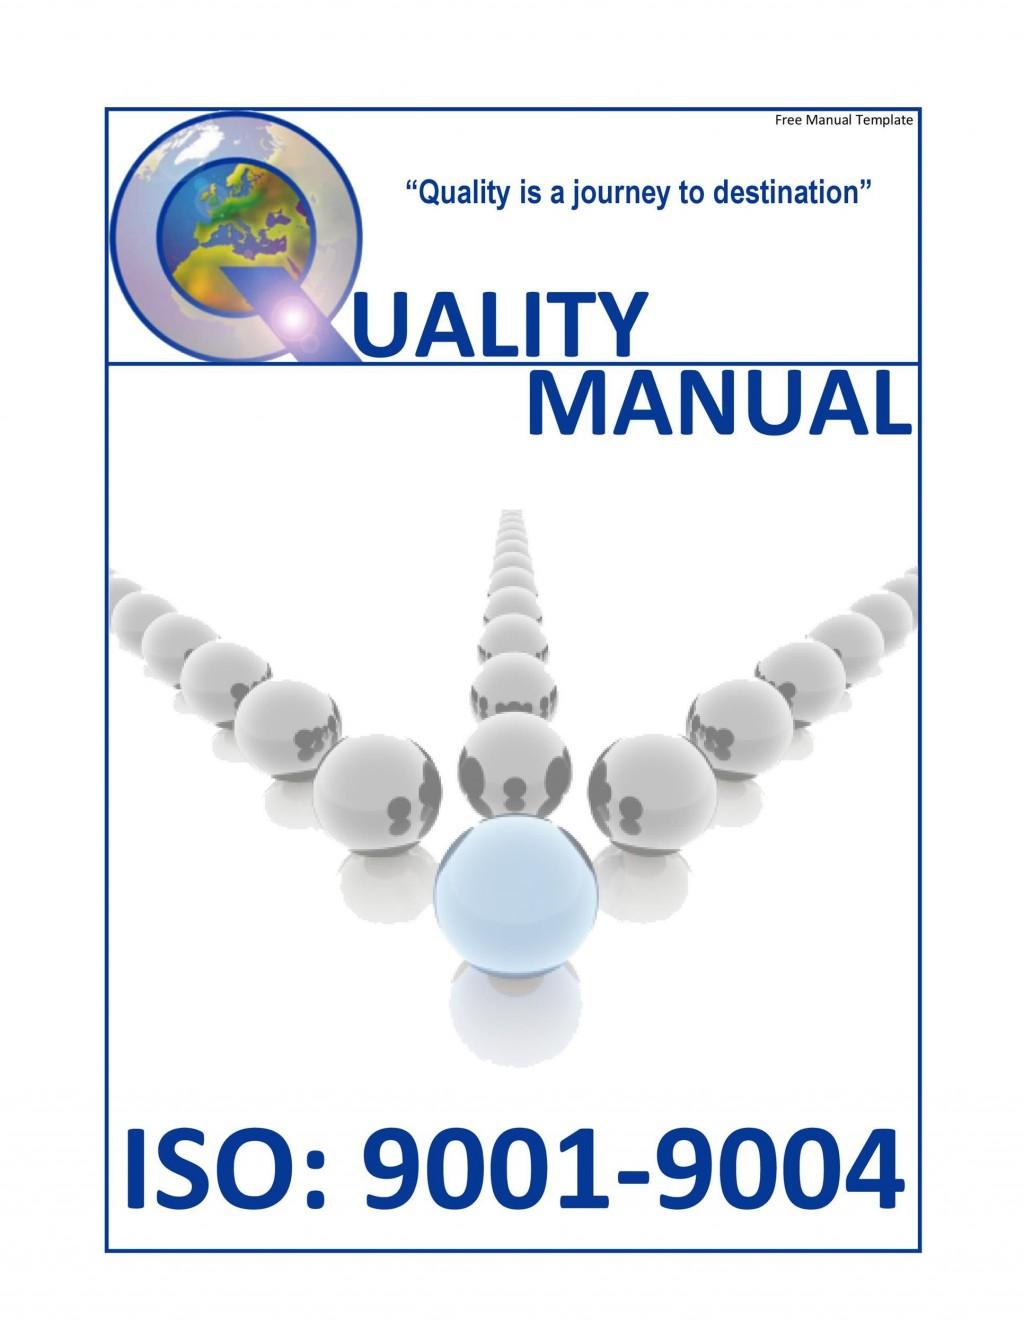 005 Unbelievable Free Employee Handbook Template Word High Resolution  Sample In Training ManualLarge